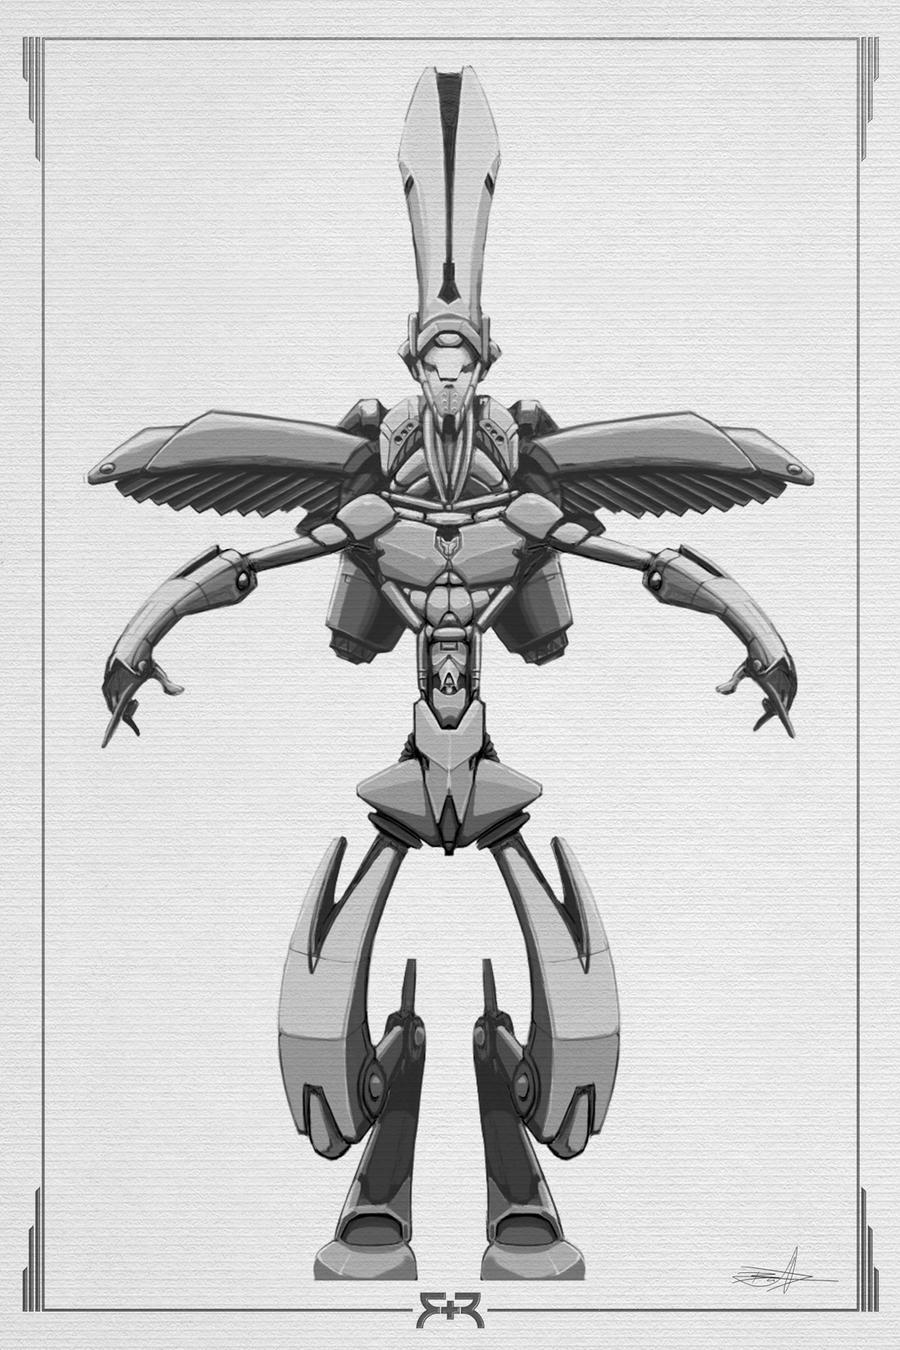 DOODLES - Robots 01 by VR-Robotica